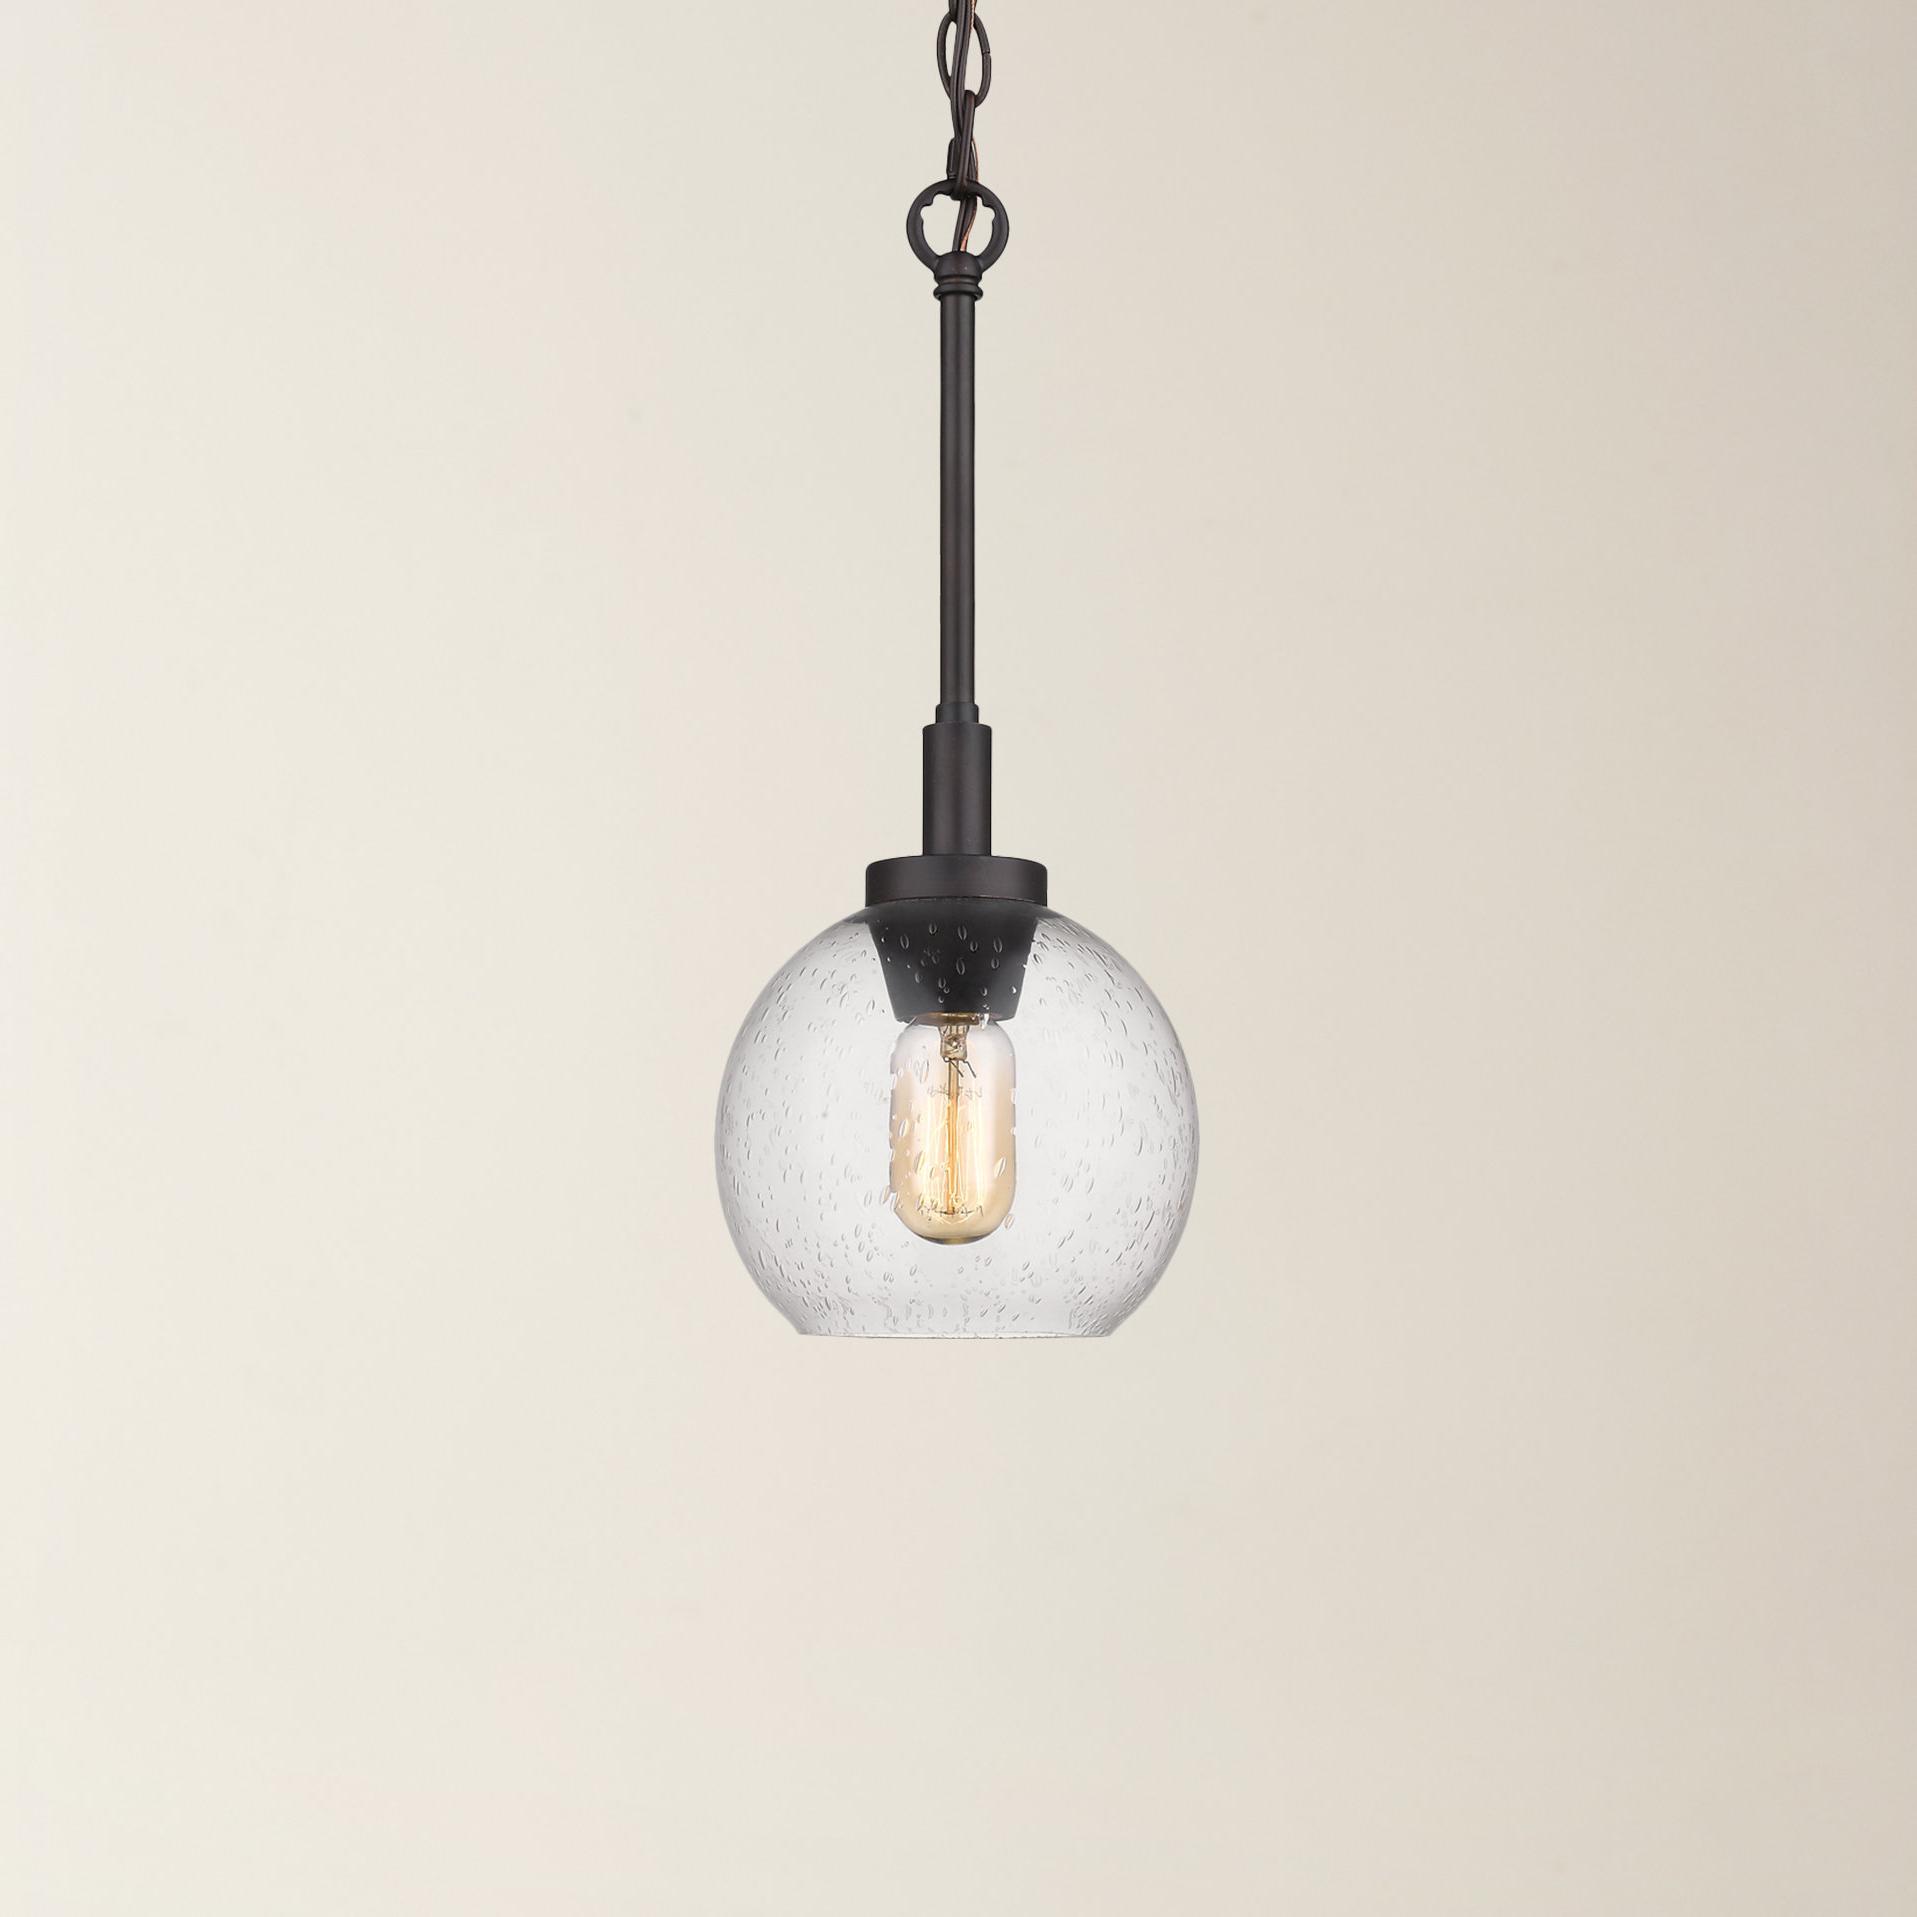 Fulton 1 Light Single Globe Pendant Regarding Most Recently Released Abordale 1 Light Single Dome Pendants (View 18 of 20)